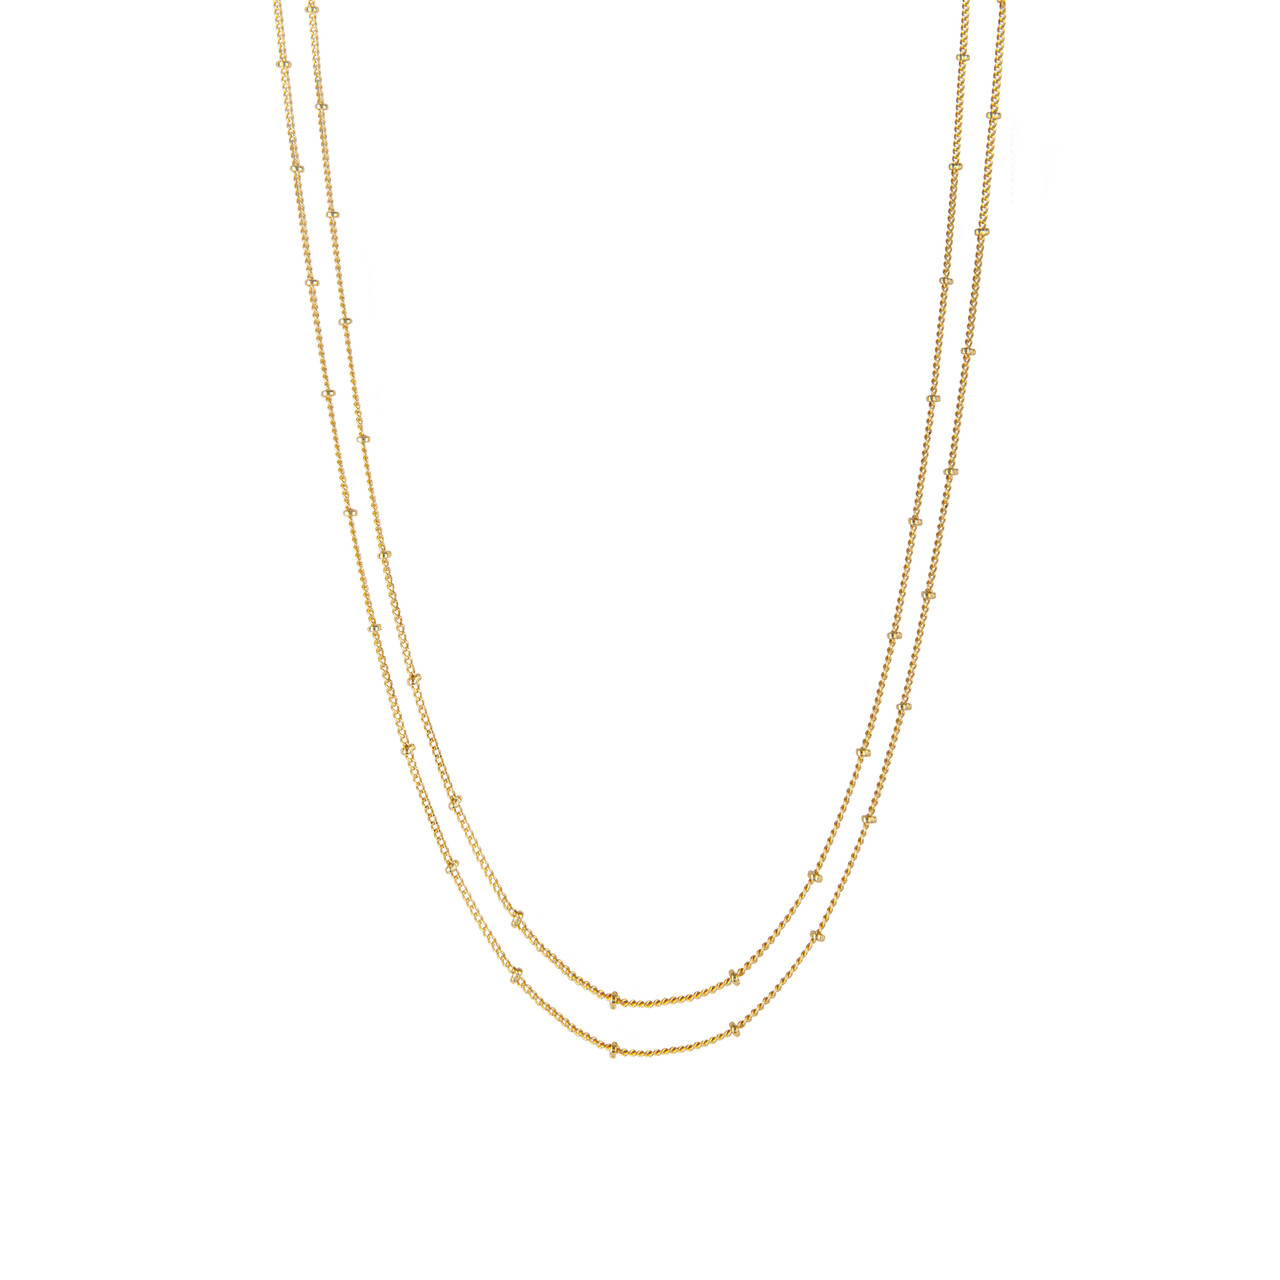 87a98c97e216f Delicate Double Chain Necklace in Gold